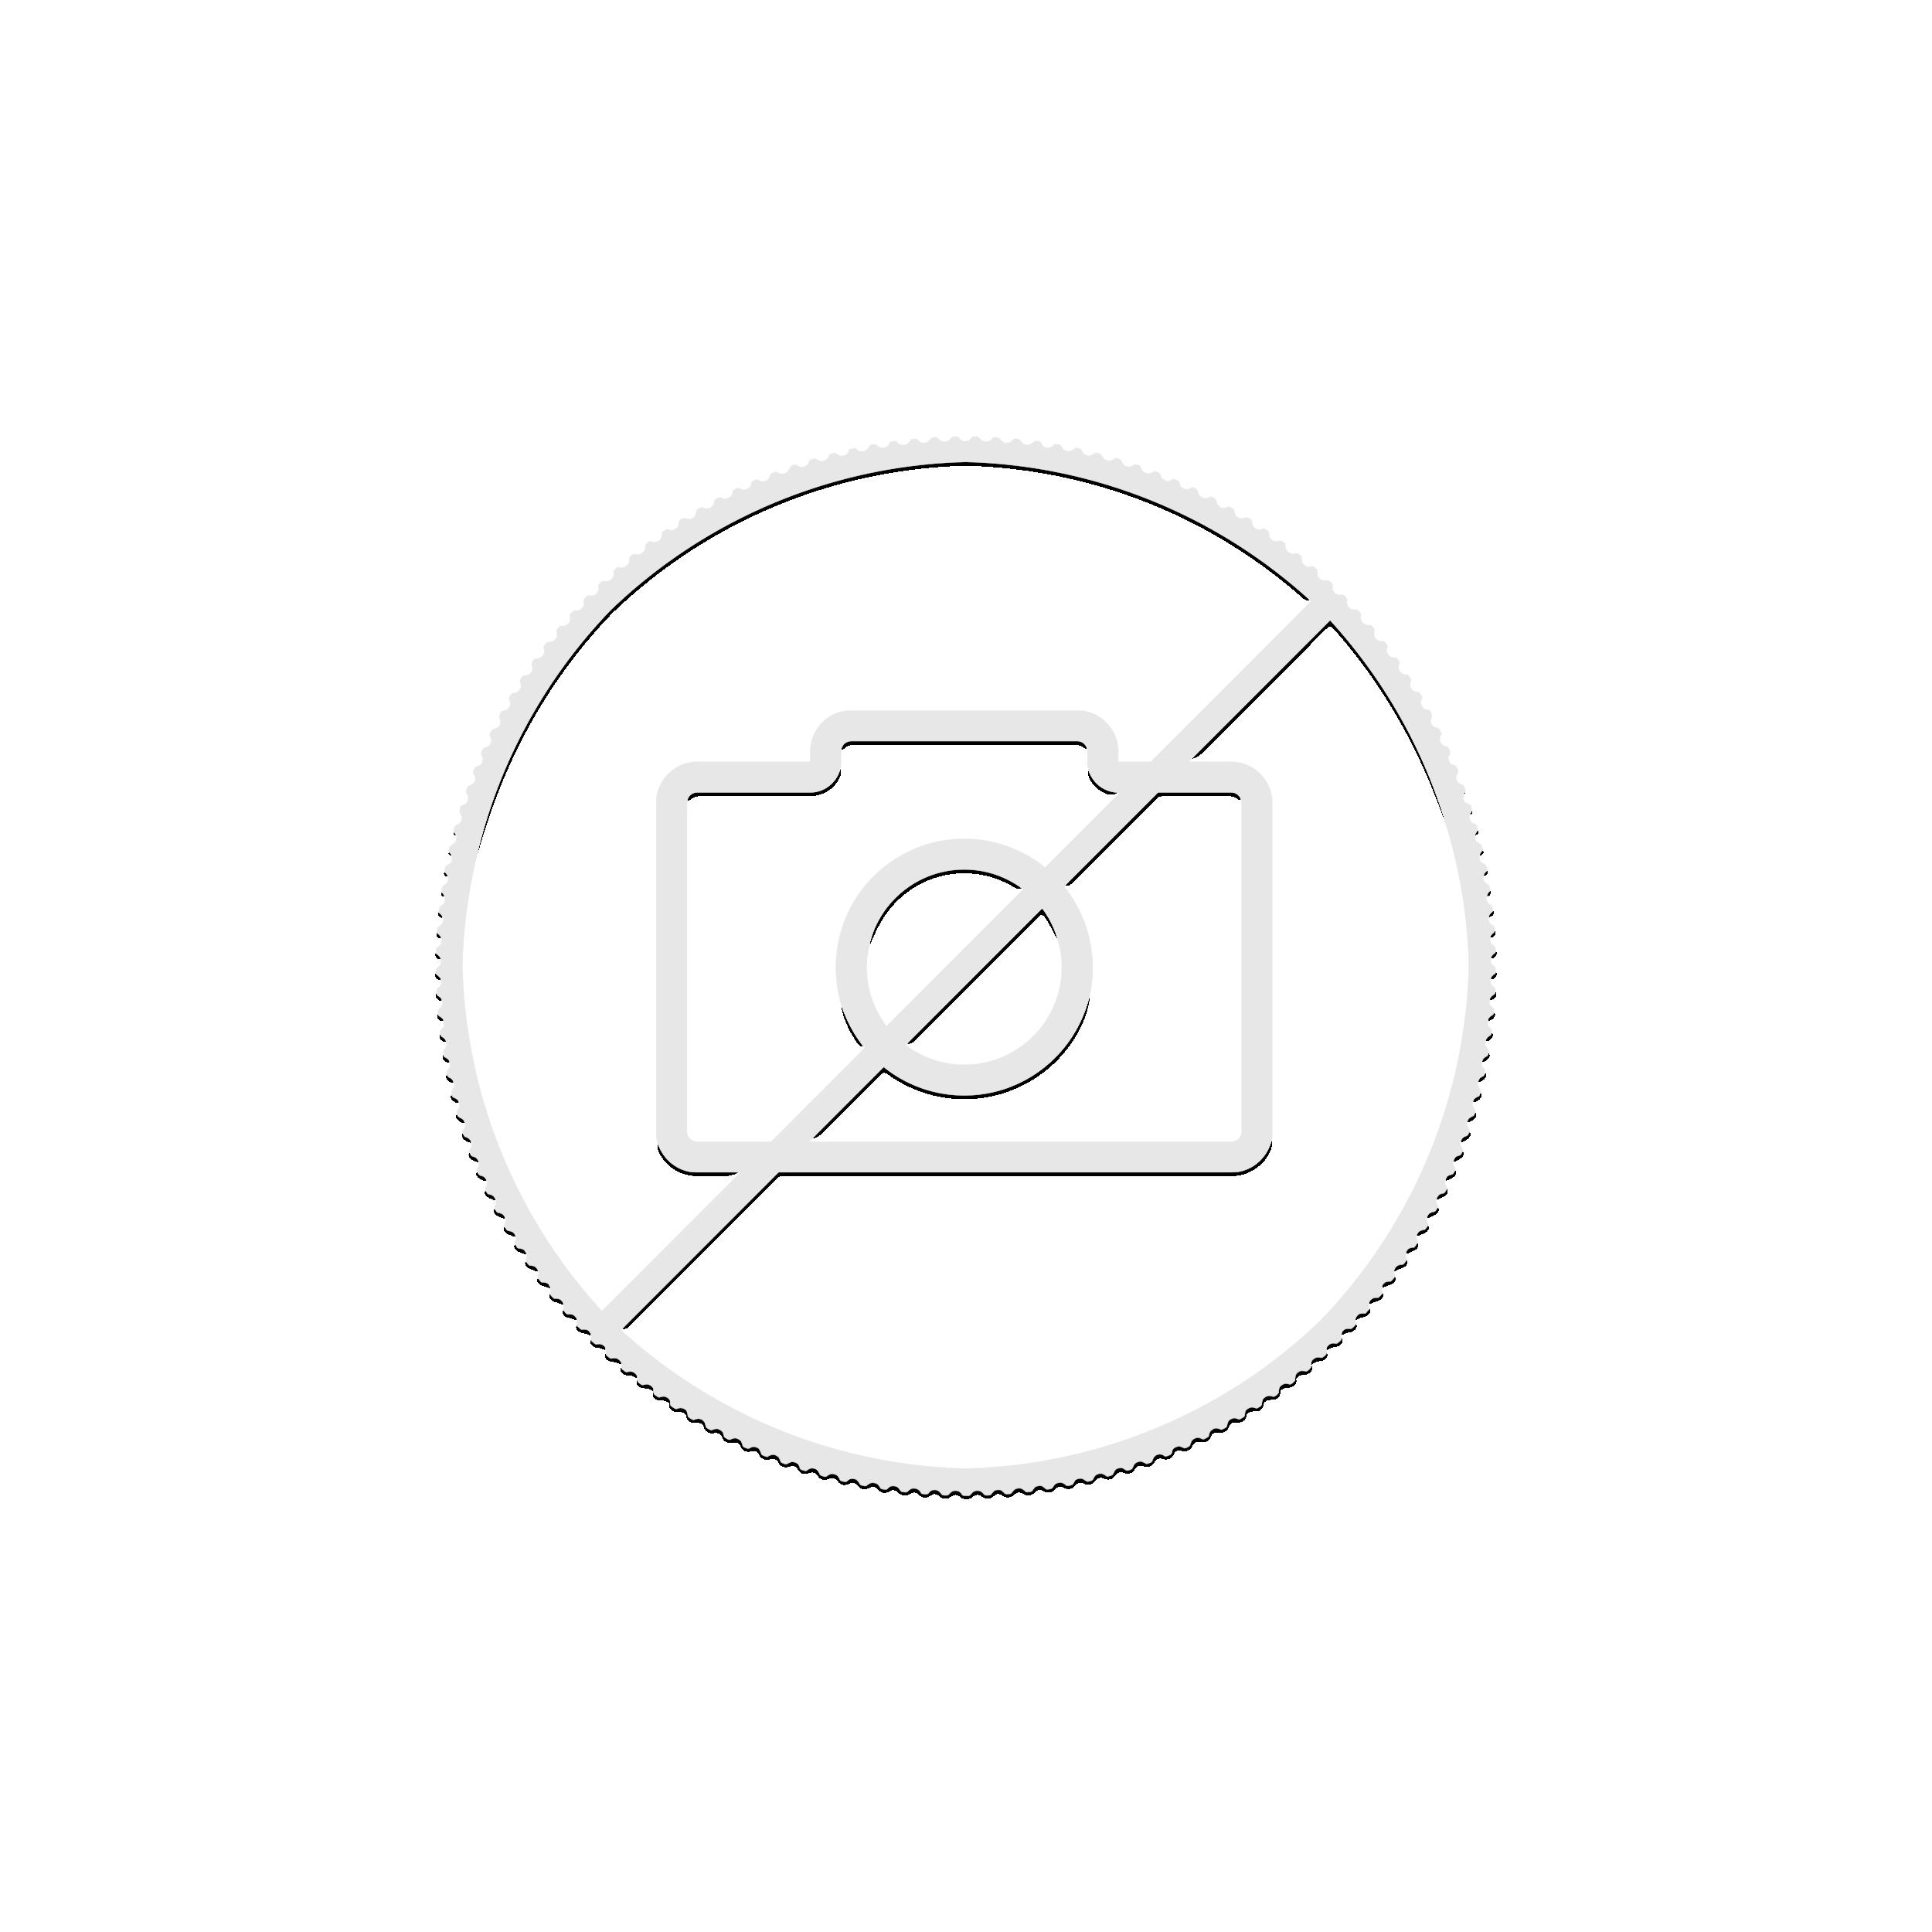 1 troy ounce zilveren munt Disney Winnie de Poeh 2020 - Proof